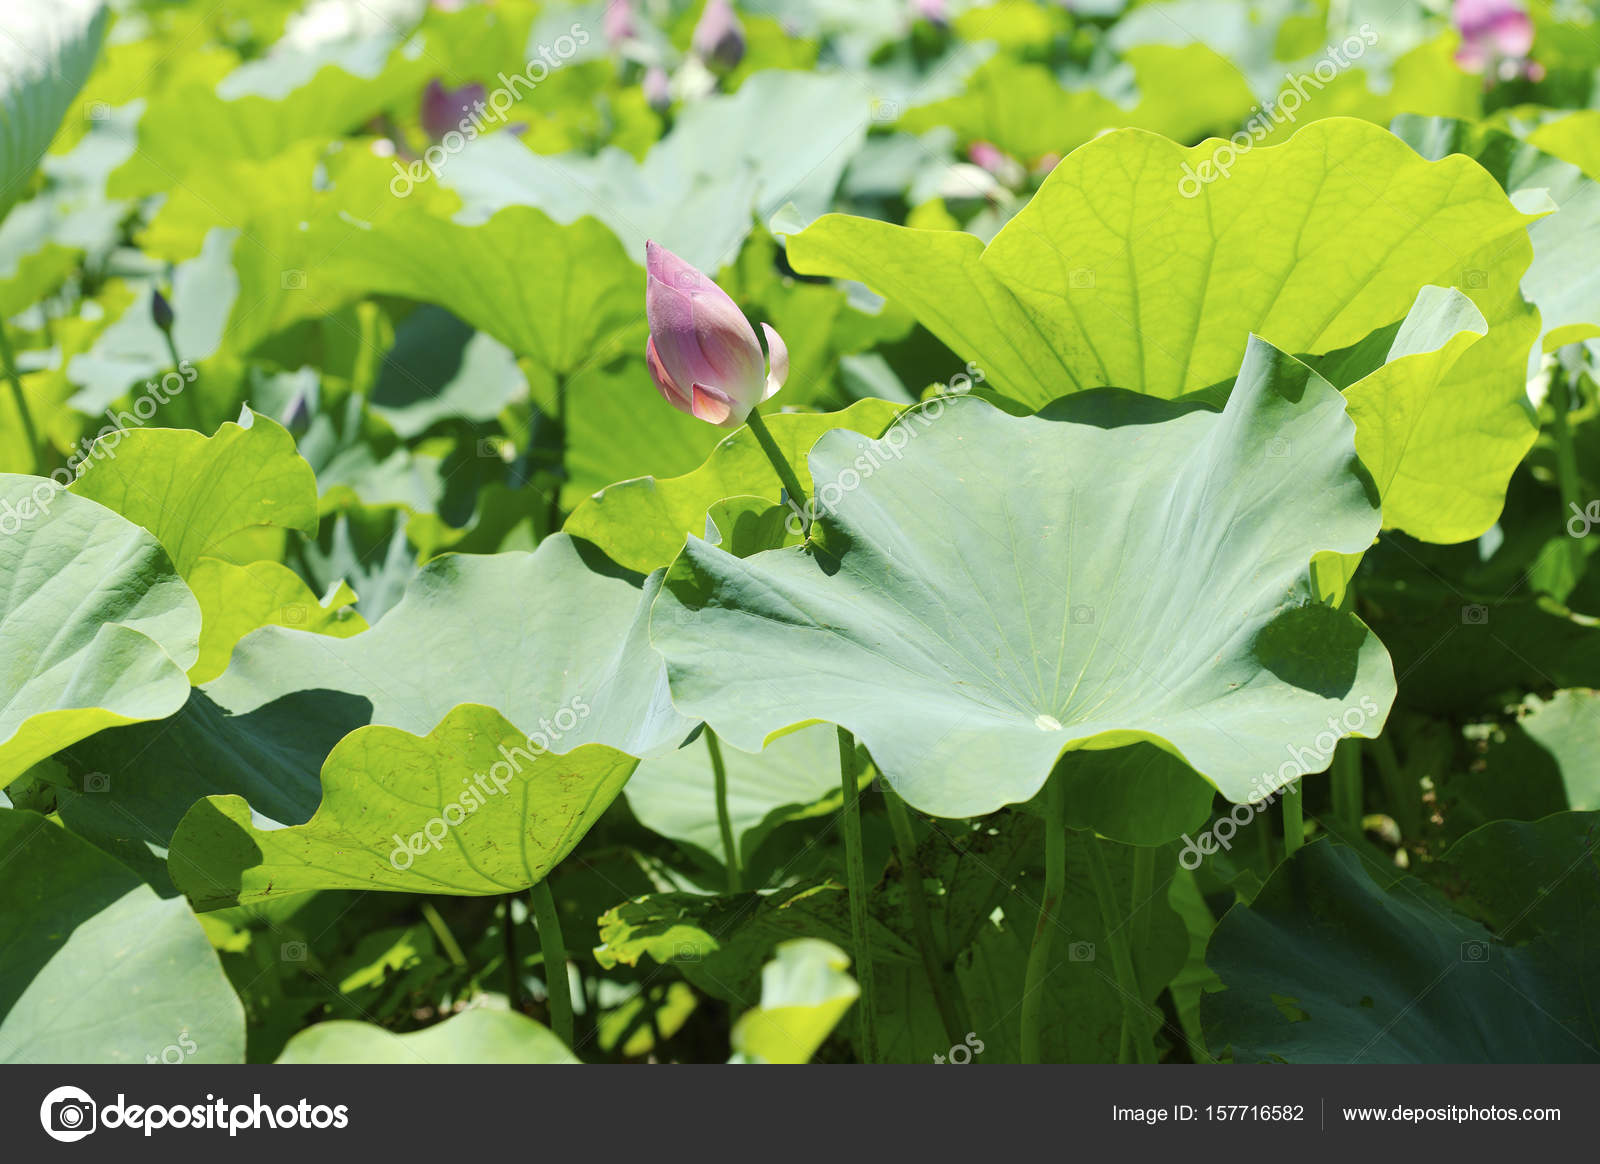 Beautiful of lotus flowers stock photo topphoto 157716582 beautiful of lotus flowers stock photo izmirmasajfo